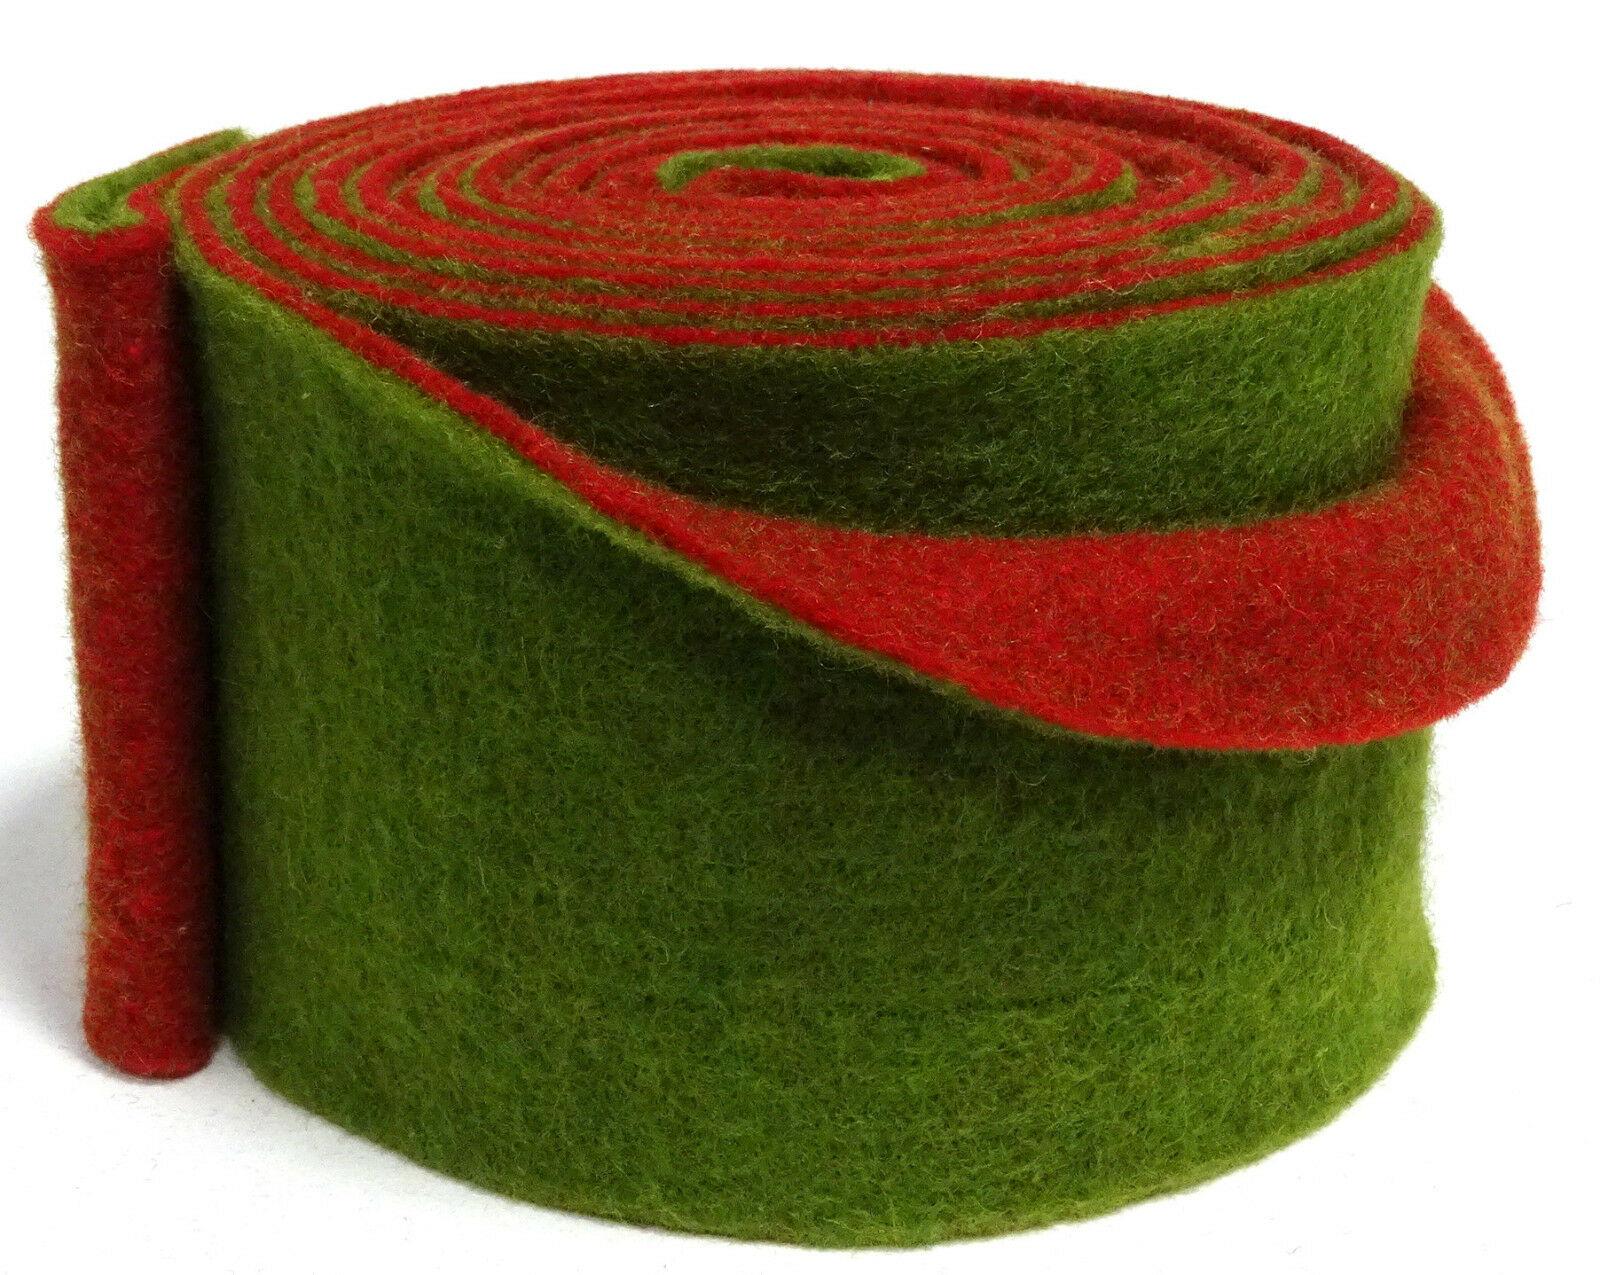 Topfband Filz 5 m x 15 cm zwei-farbige Dekoband Wollvlies Filz-Band Wollband  - rot-grün